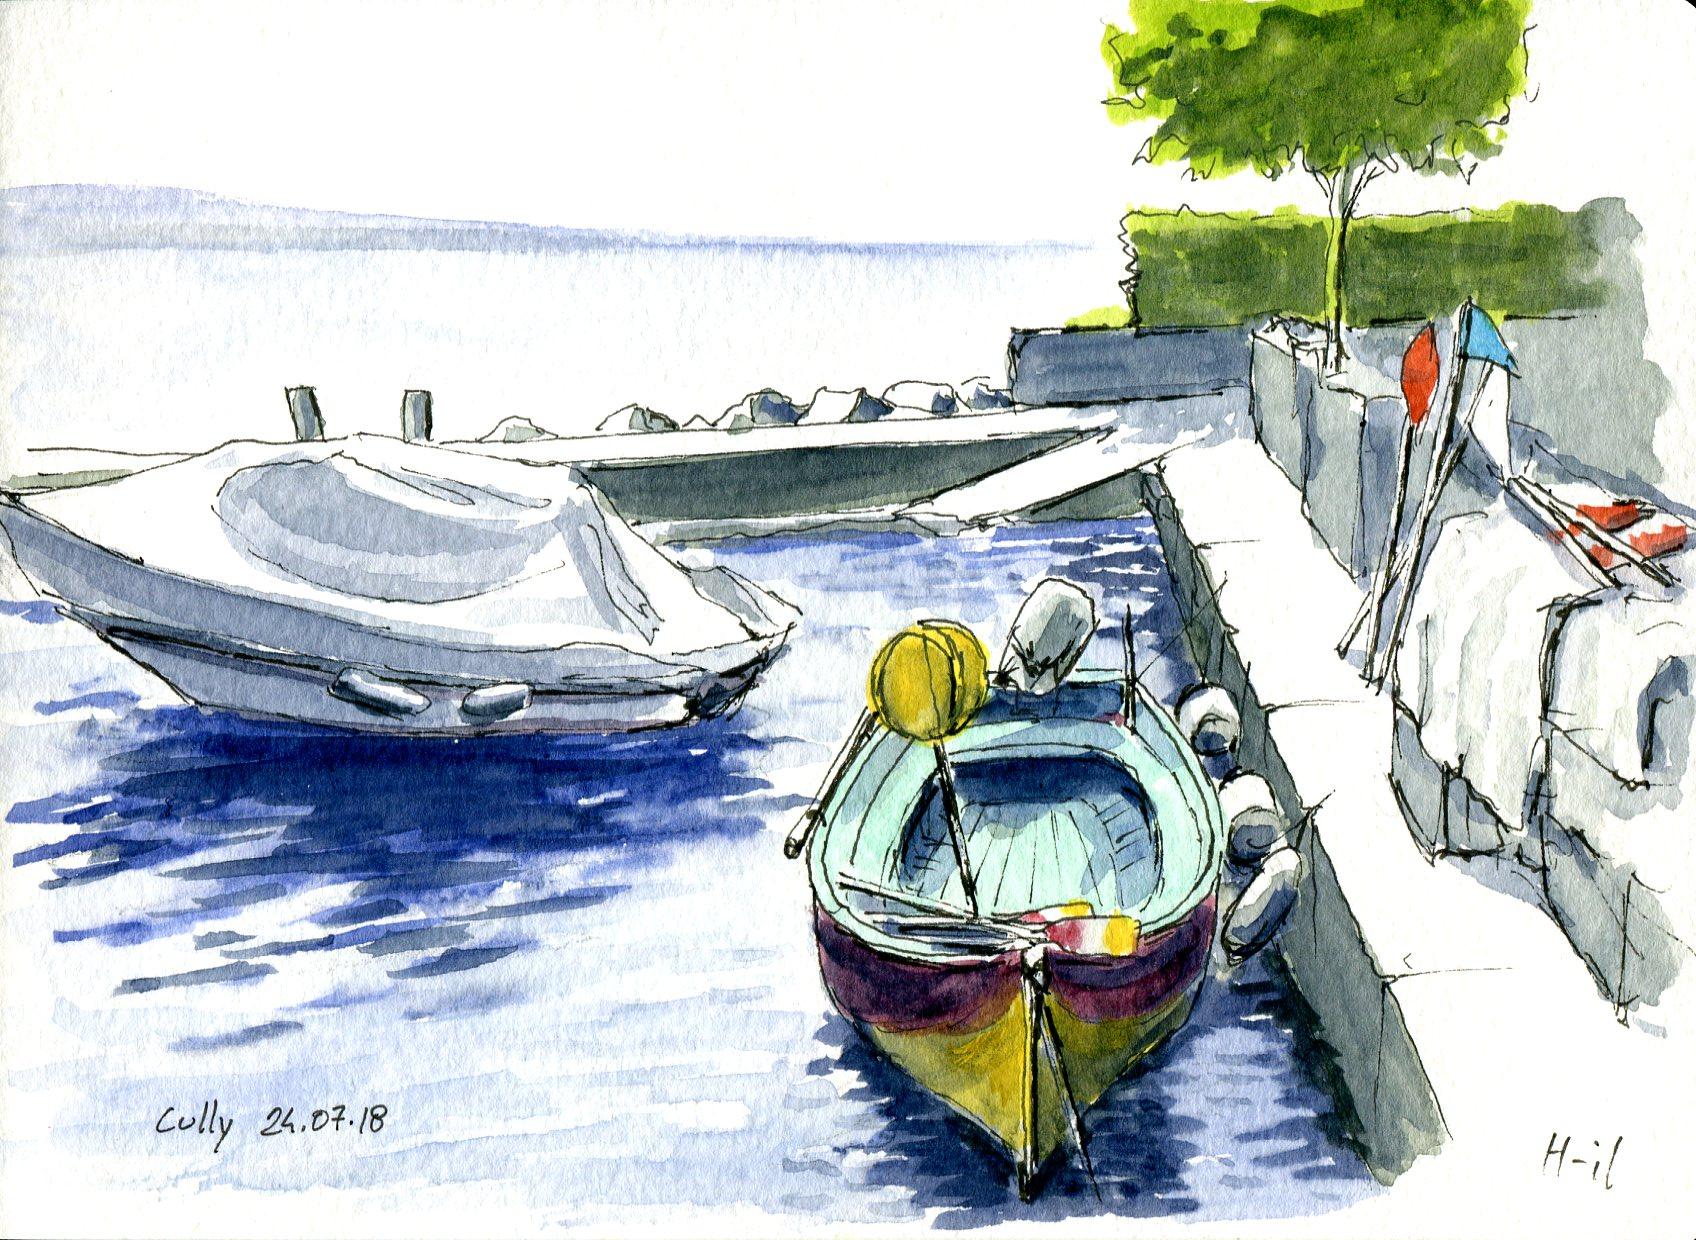 Port Cully